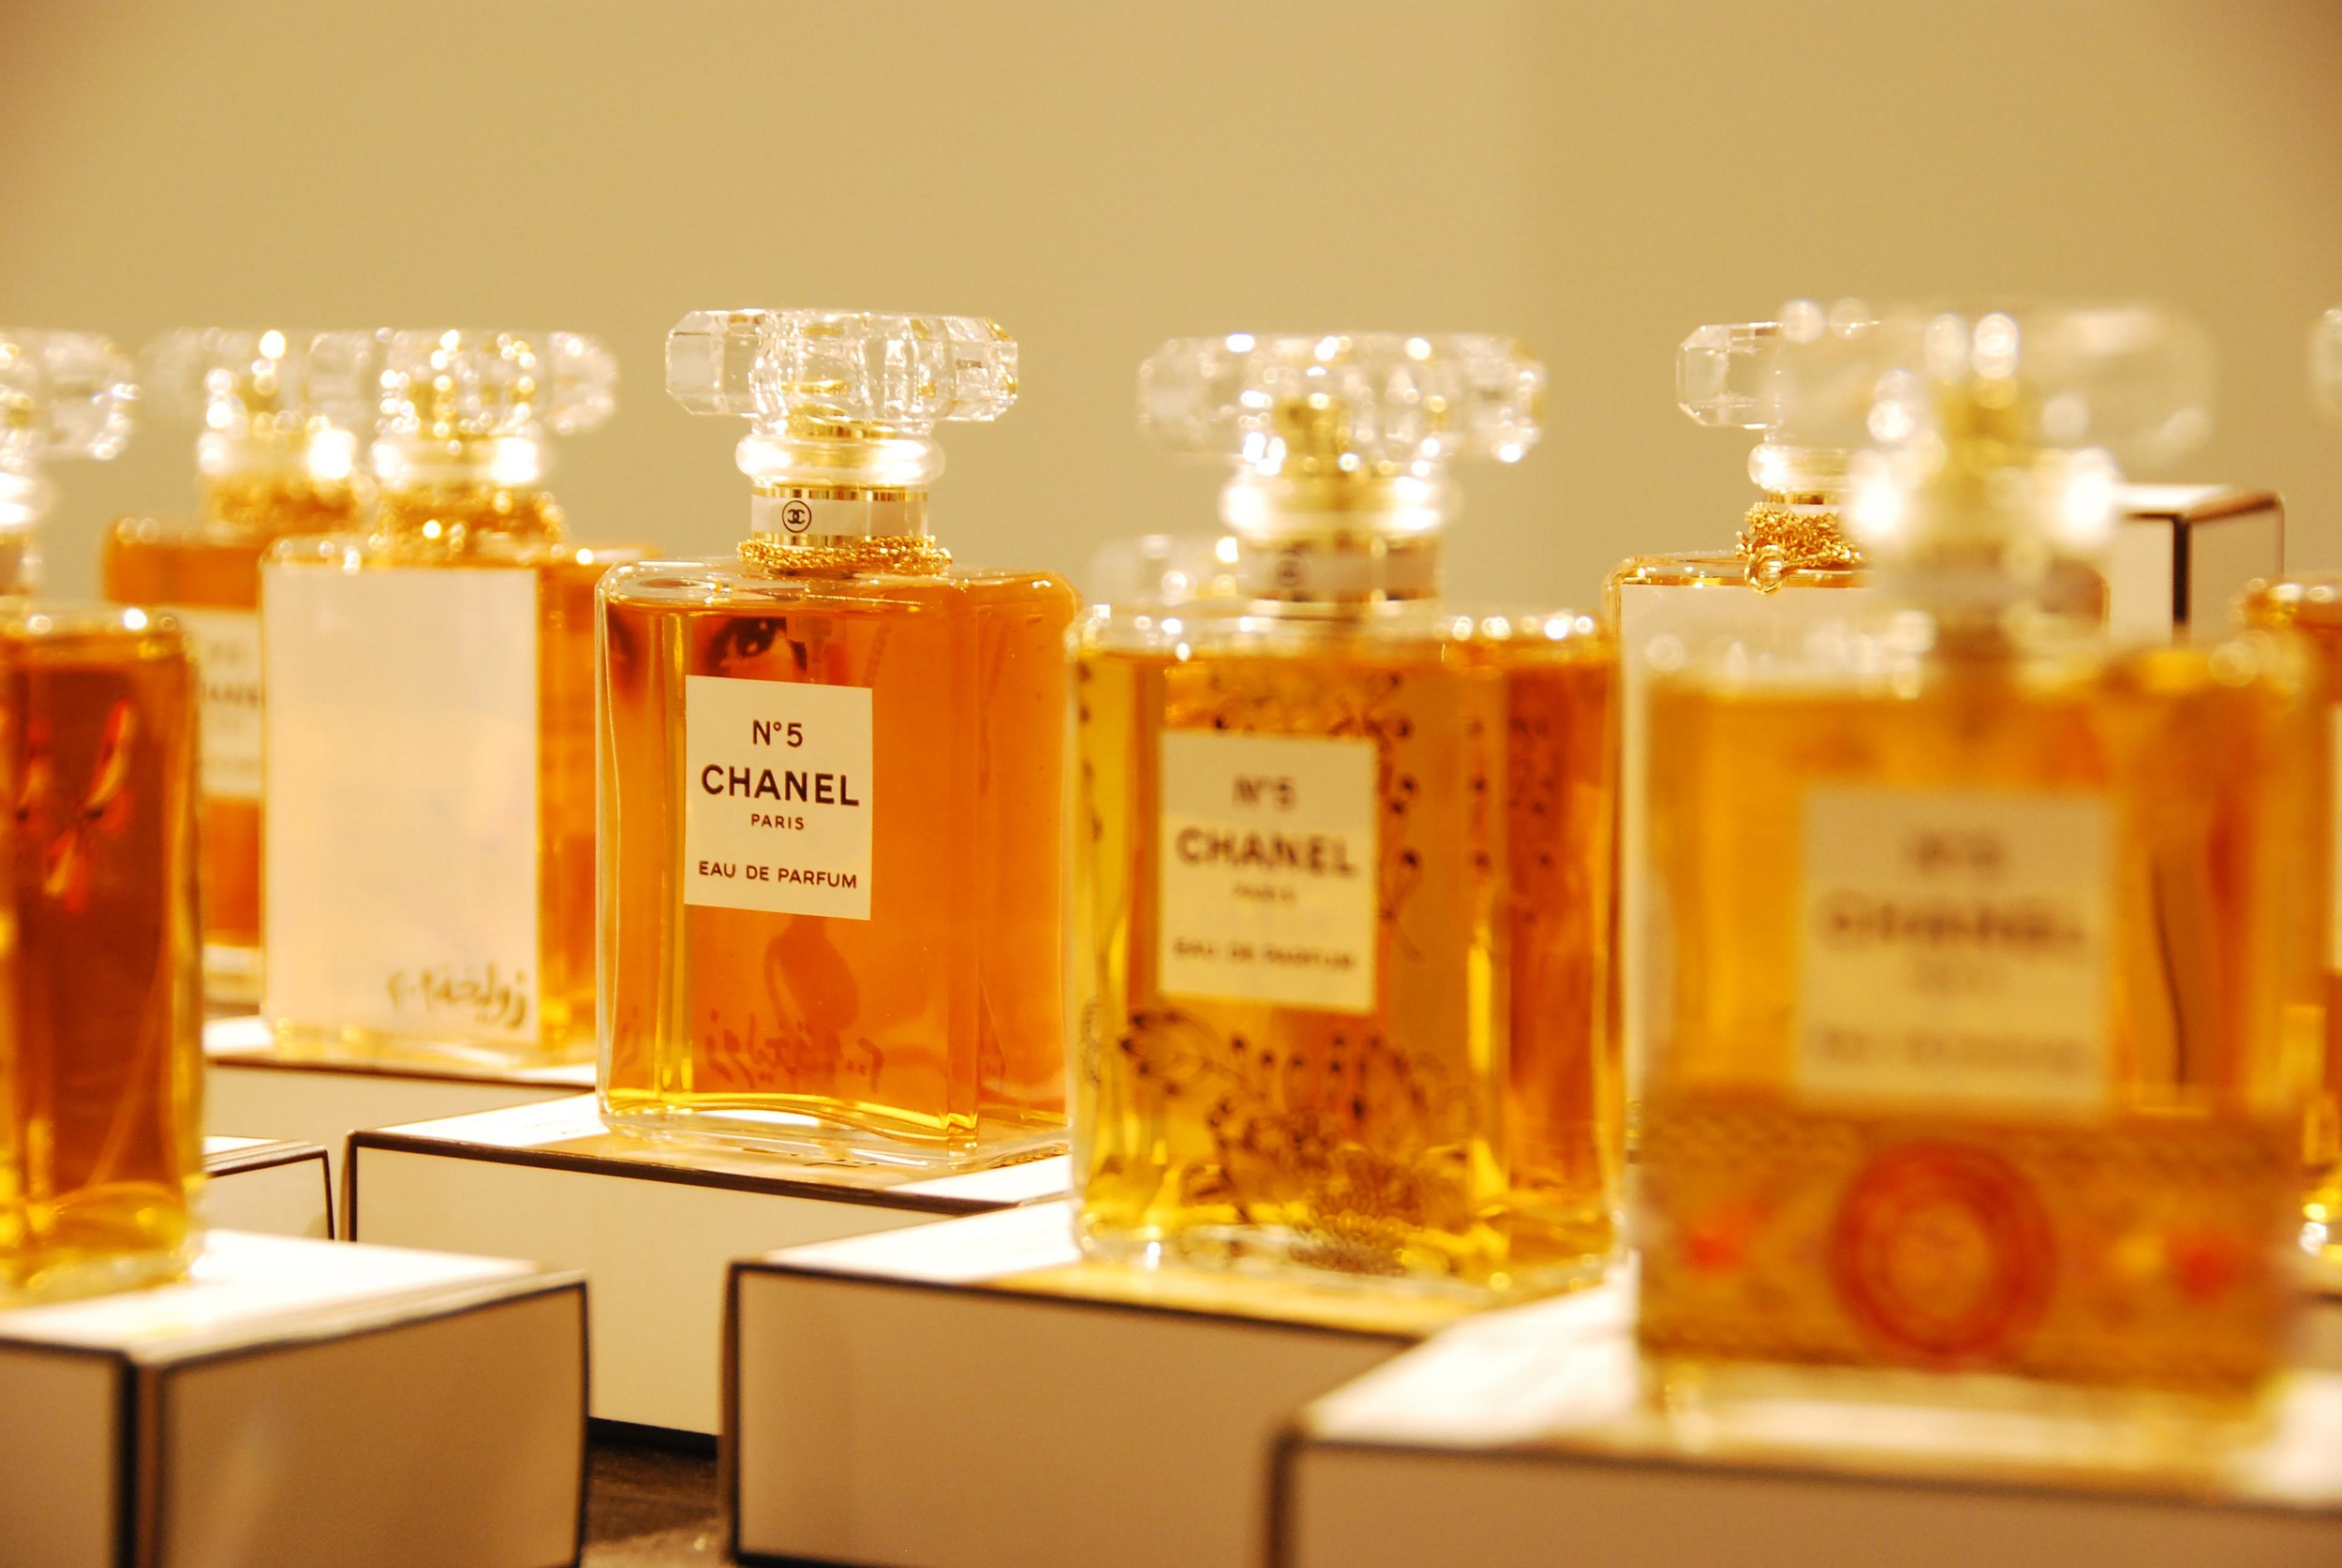 Chanel No 5 Perfume Bottles